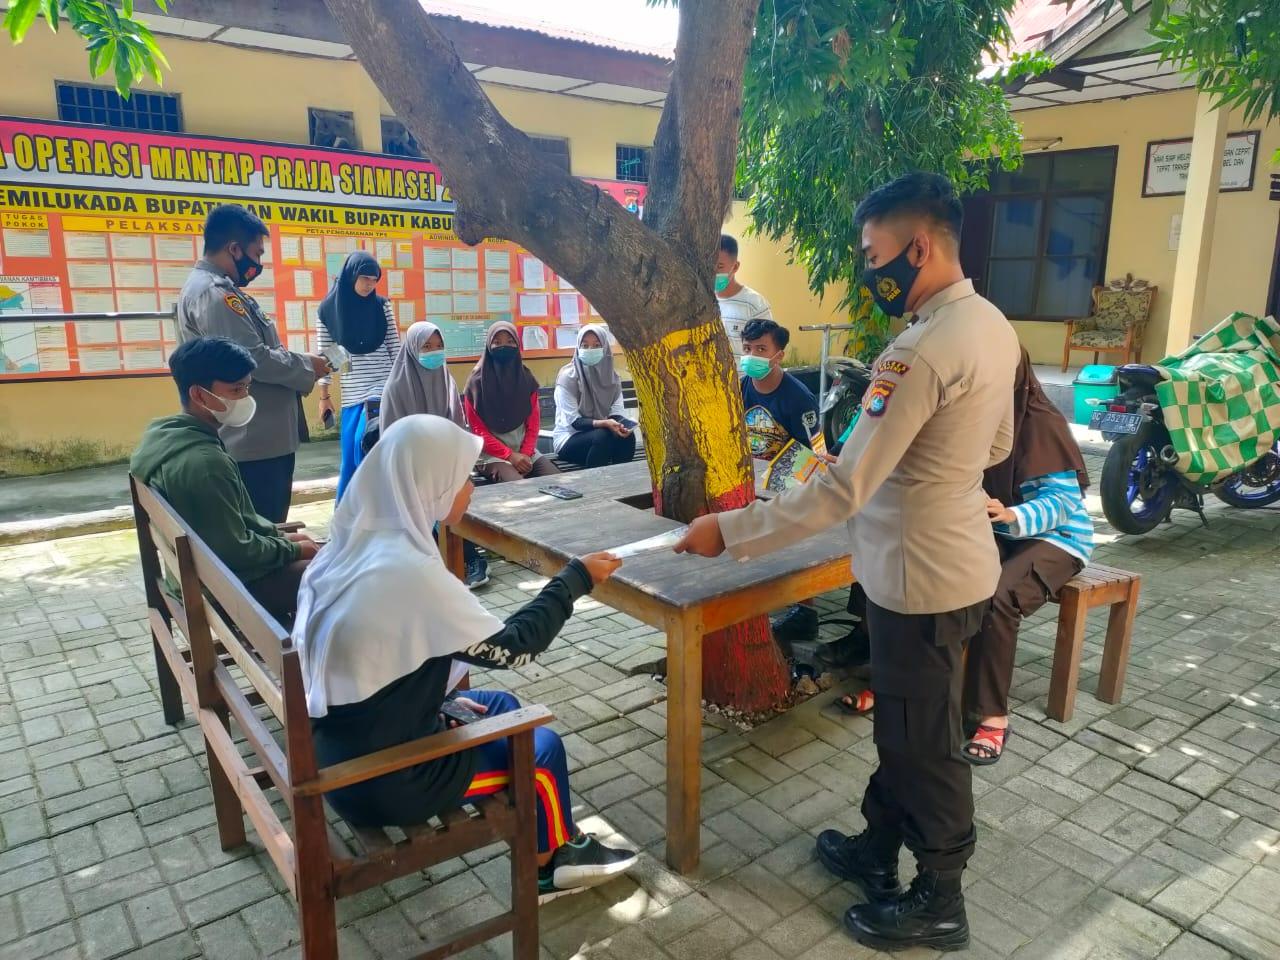 Pendaftaran Polri Dibuka, SDM Polres Majene Mulai Jaring Minat Generasi Muda